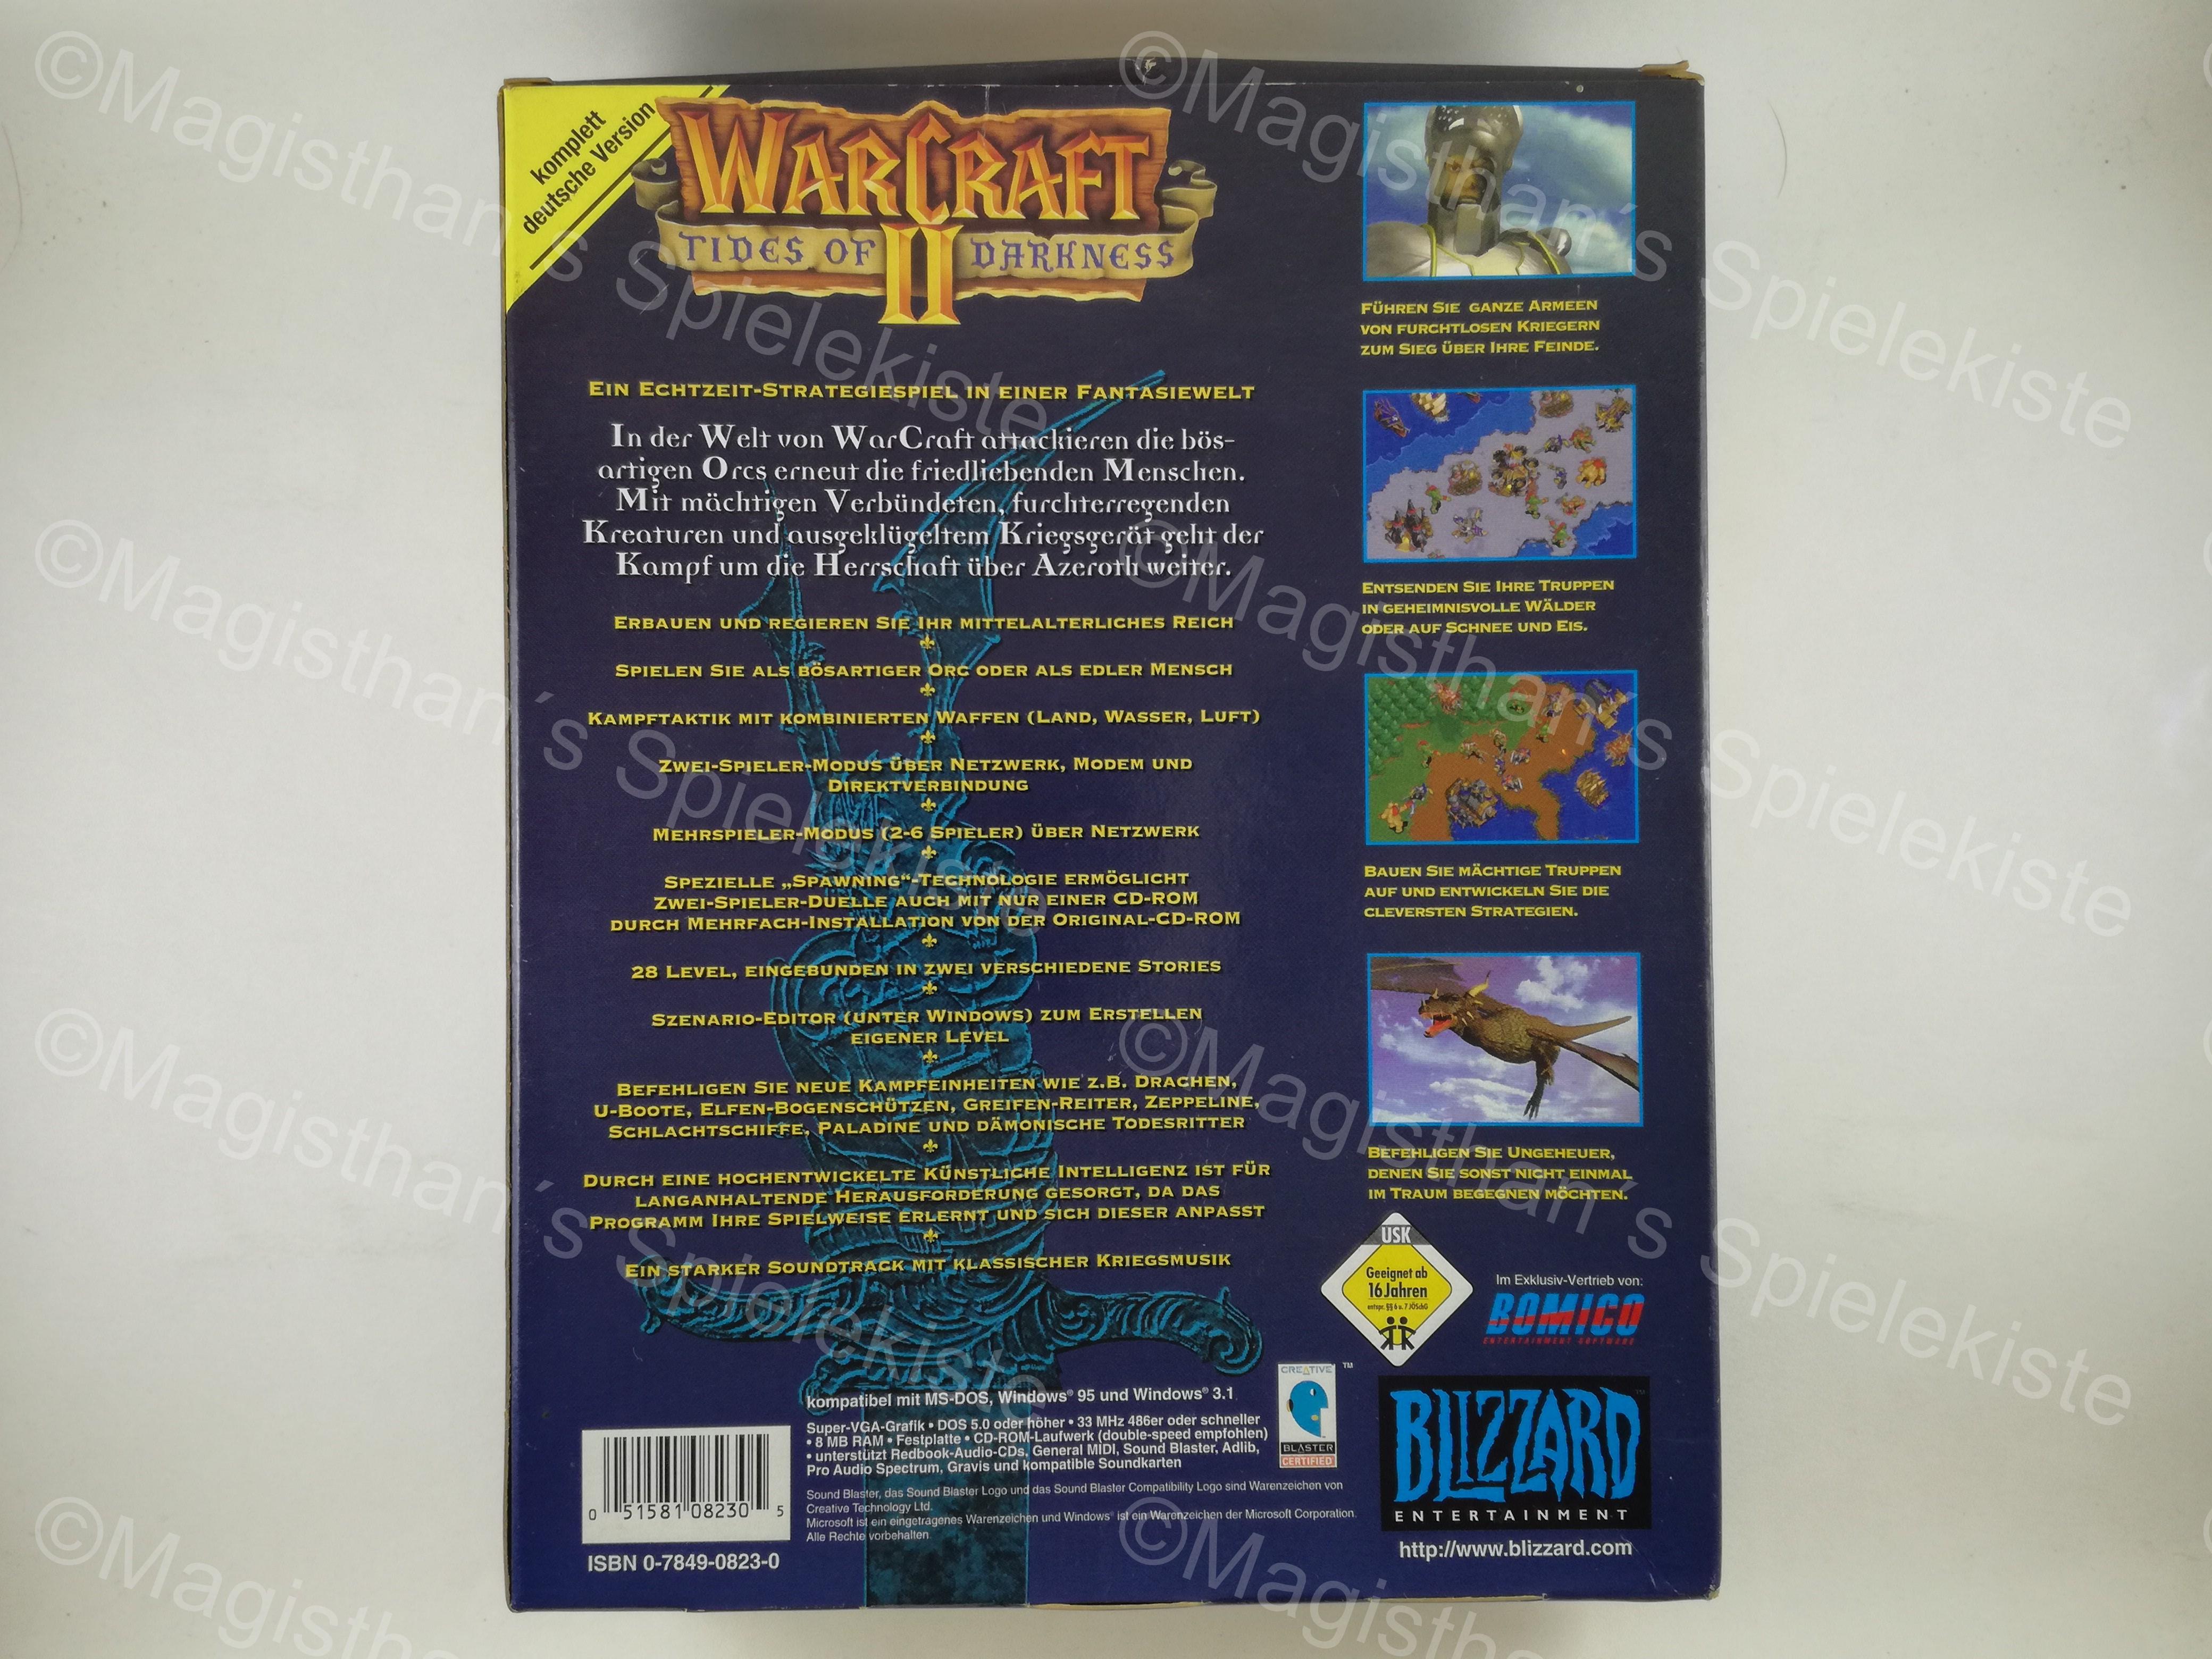 Warcraft2_TidesofDarkness1b_back.jpg